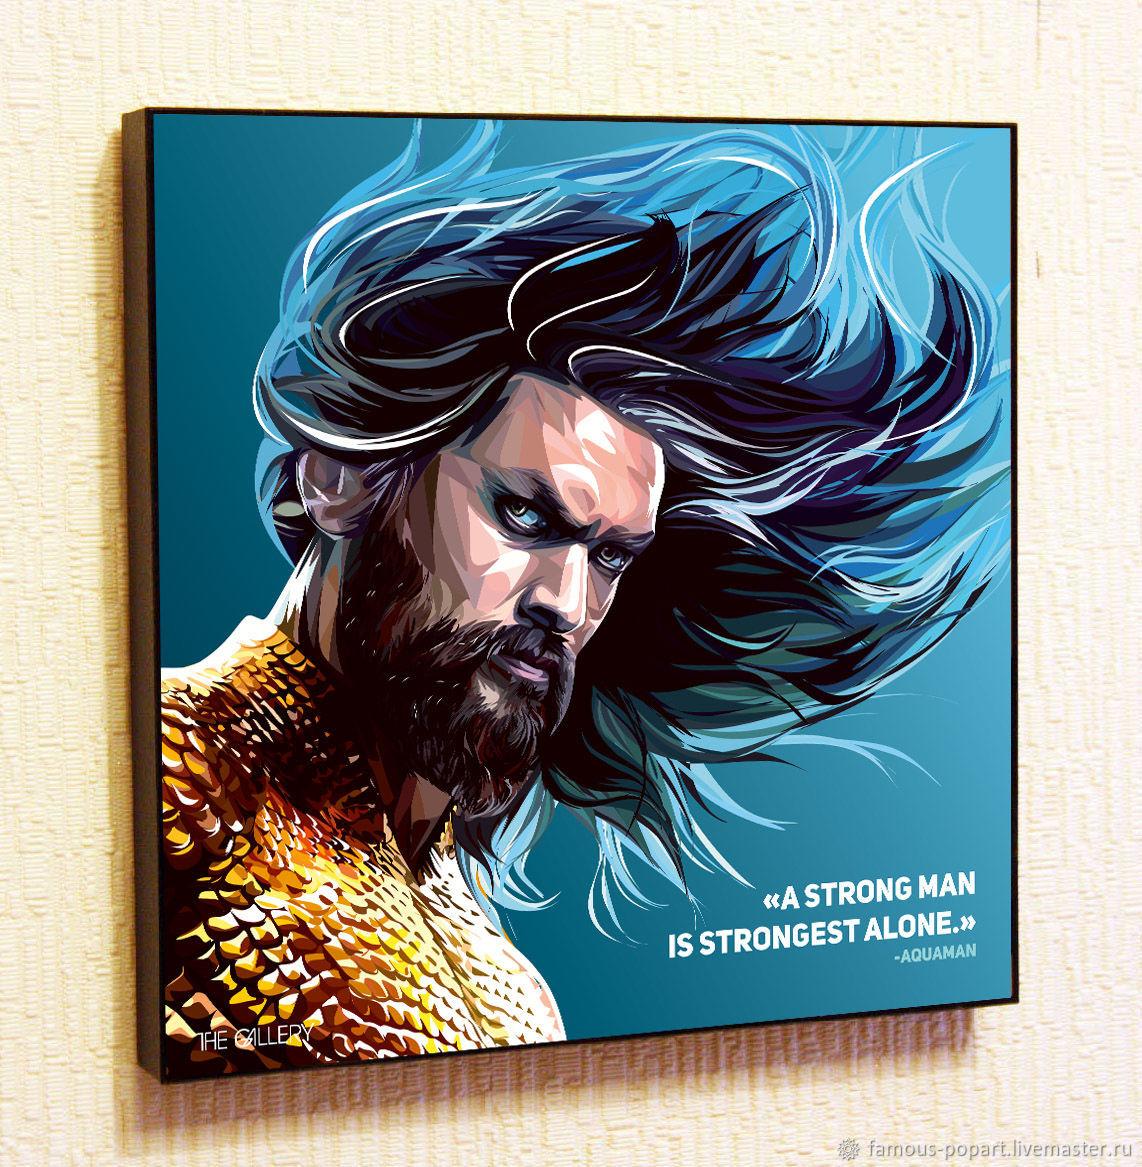 Picture Poster Aquaman Comics DC justice League Pop Art, Fine art photographs, Moscow,  Фото №1